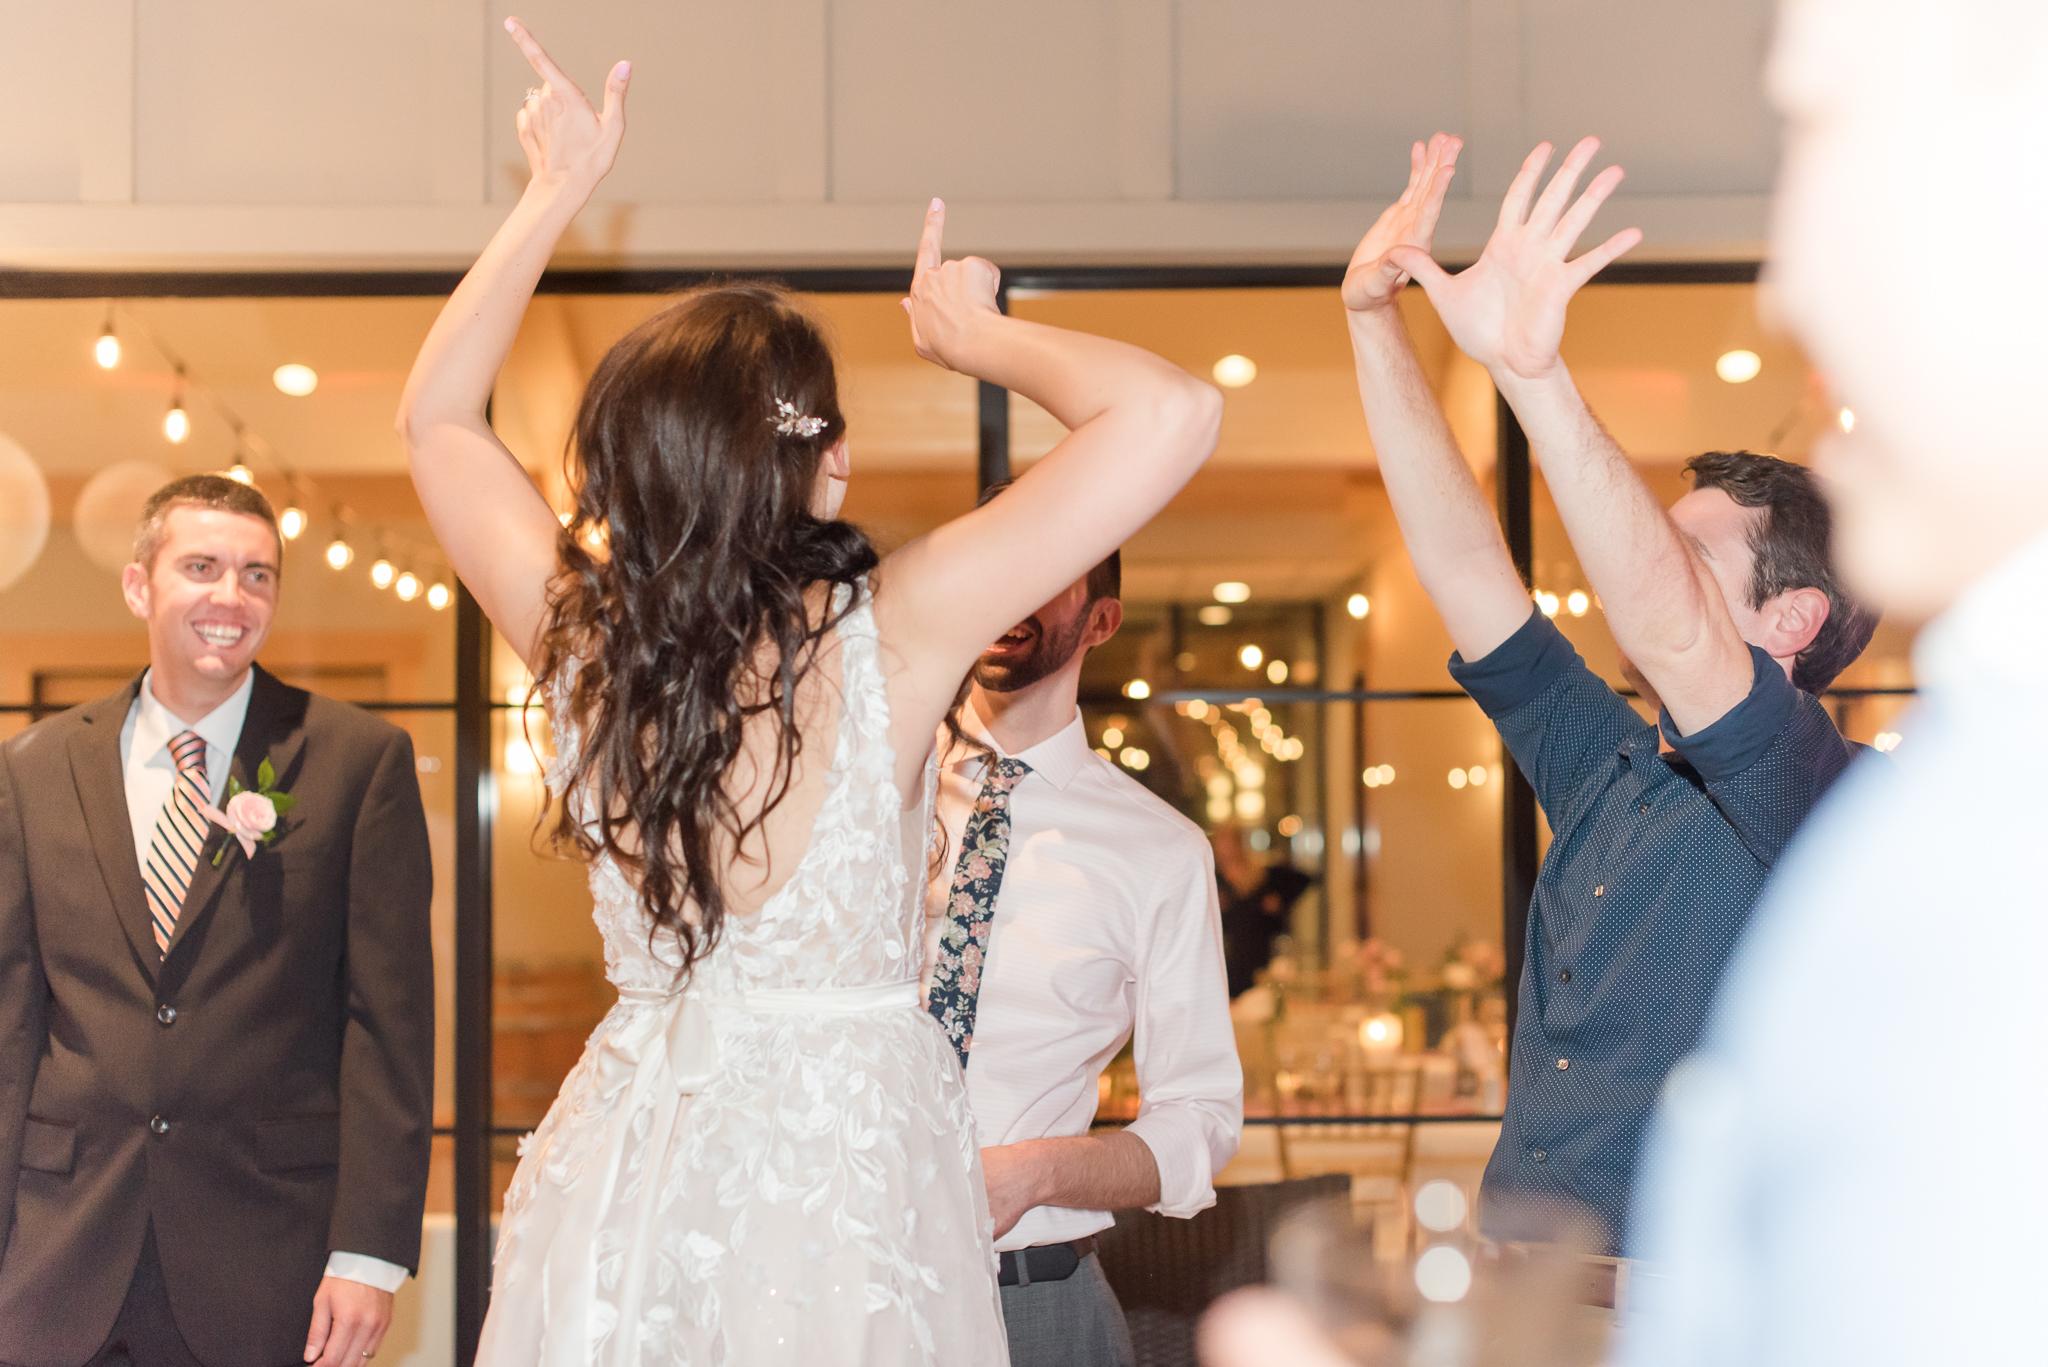 Sycamore at Mallow Run Wedding6993.jpg